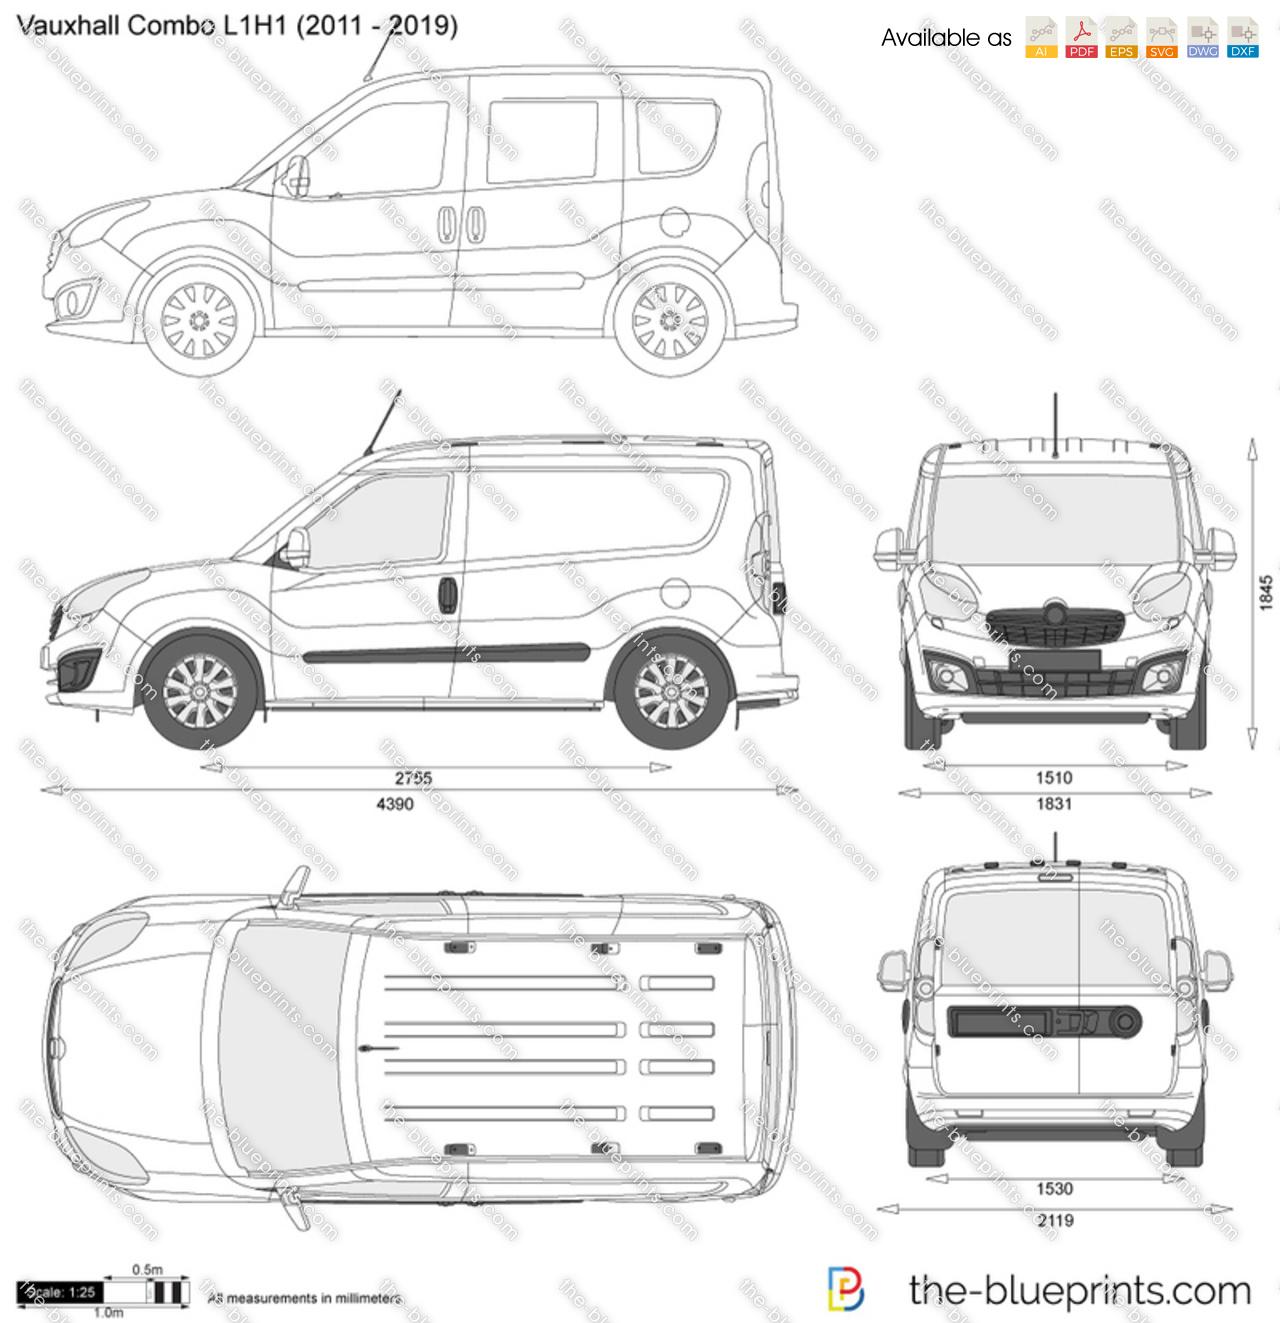 Vauxhall Combo L1H1